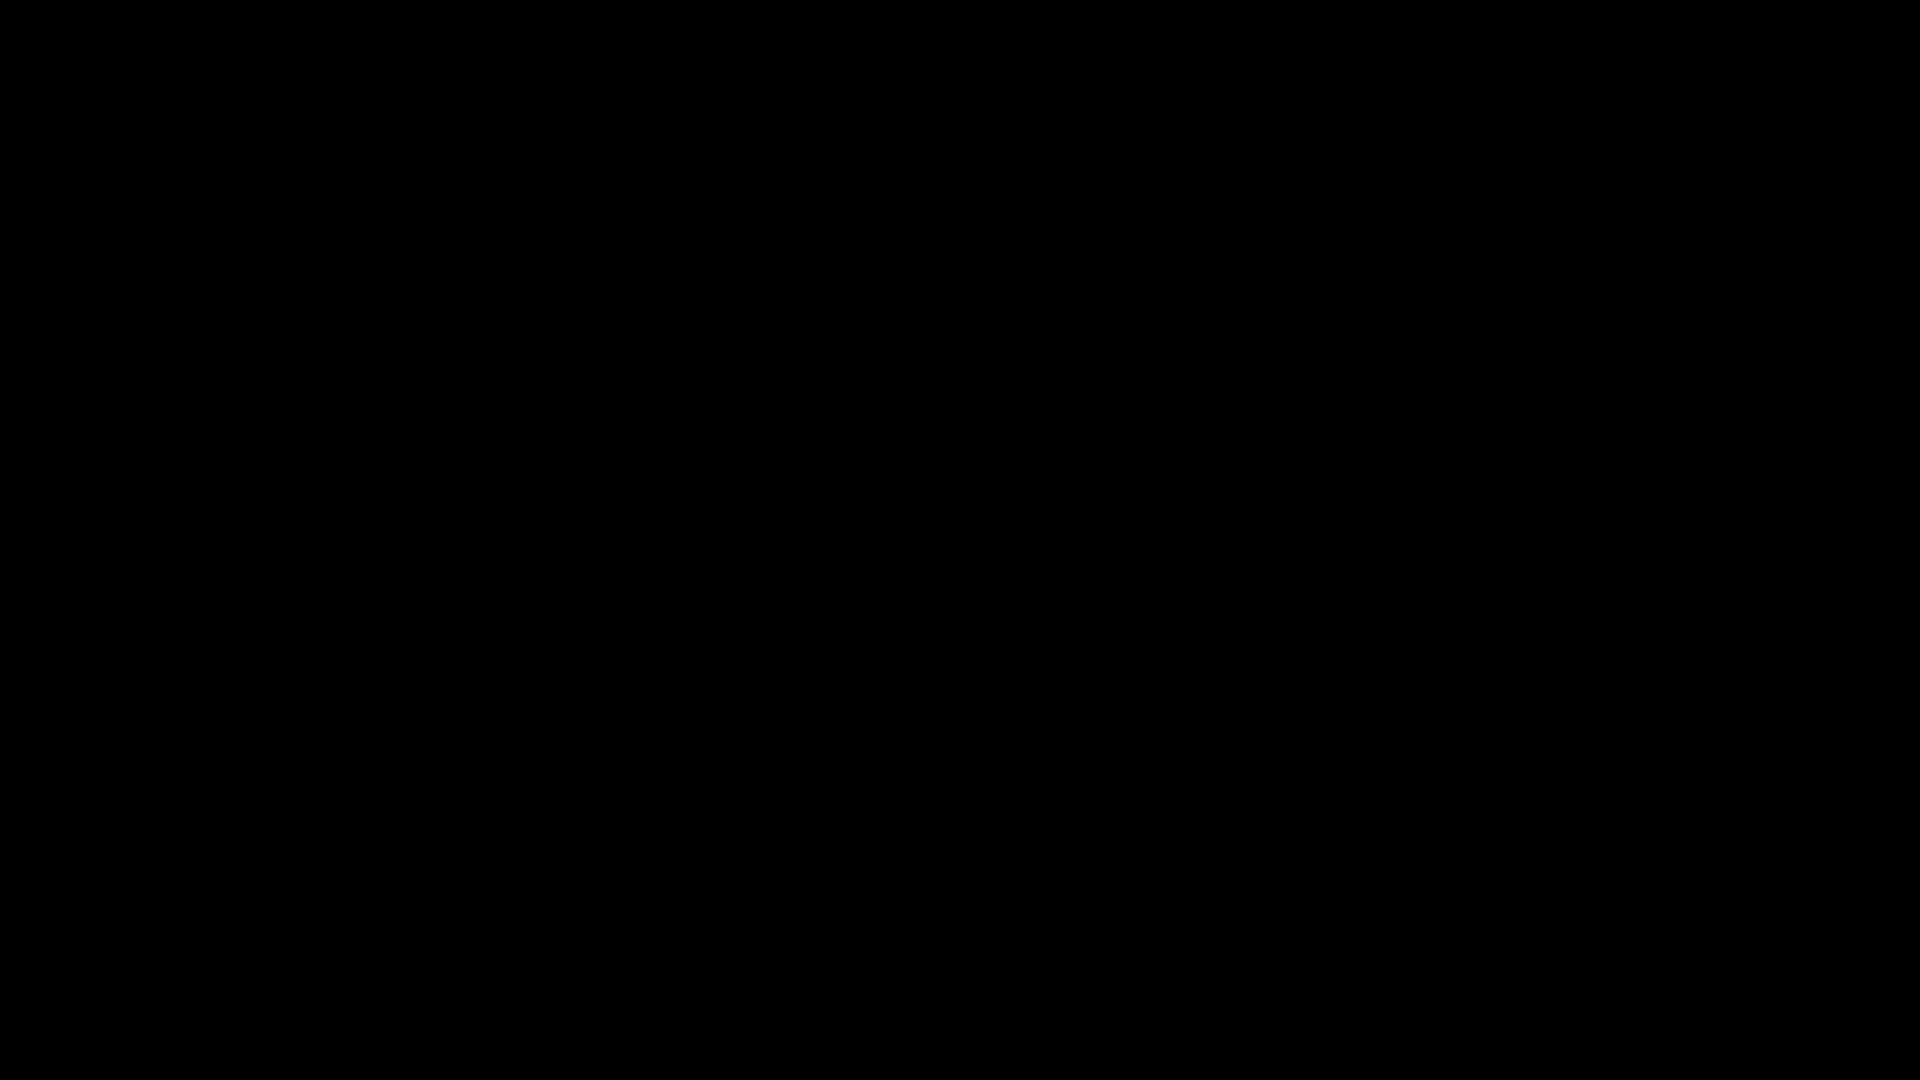 TinyMS logo